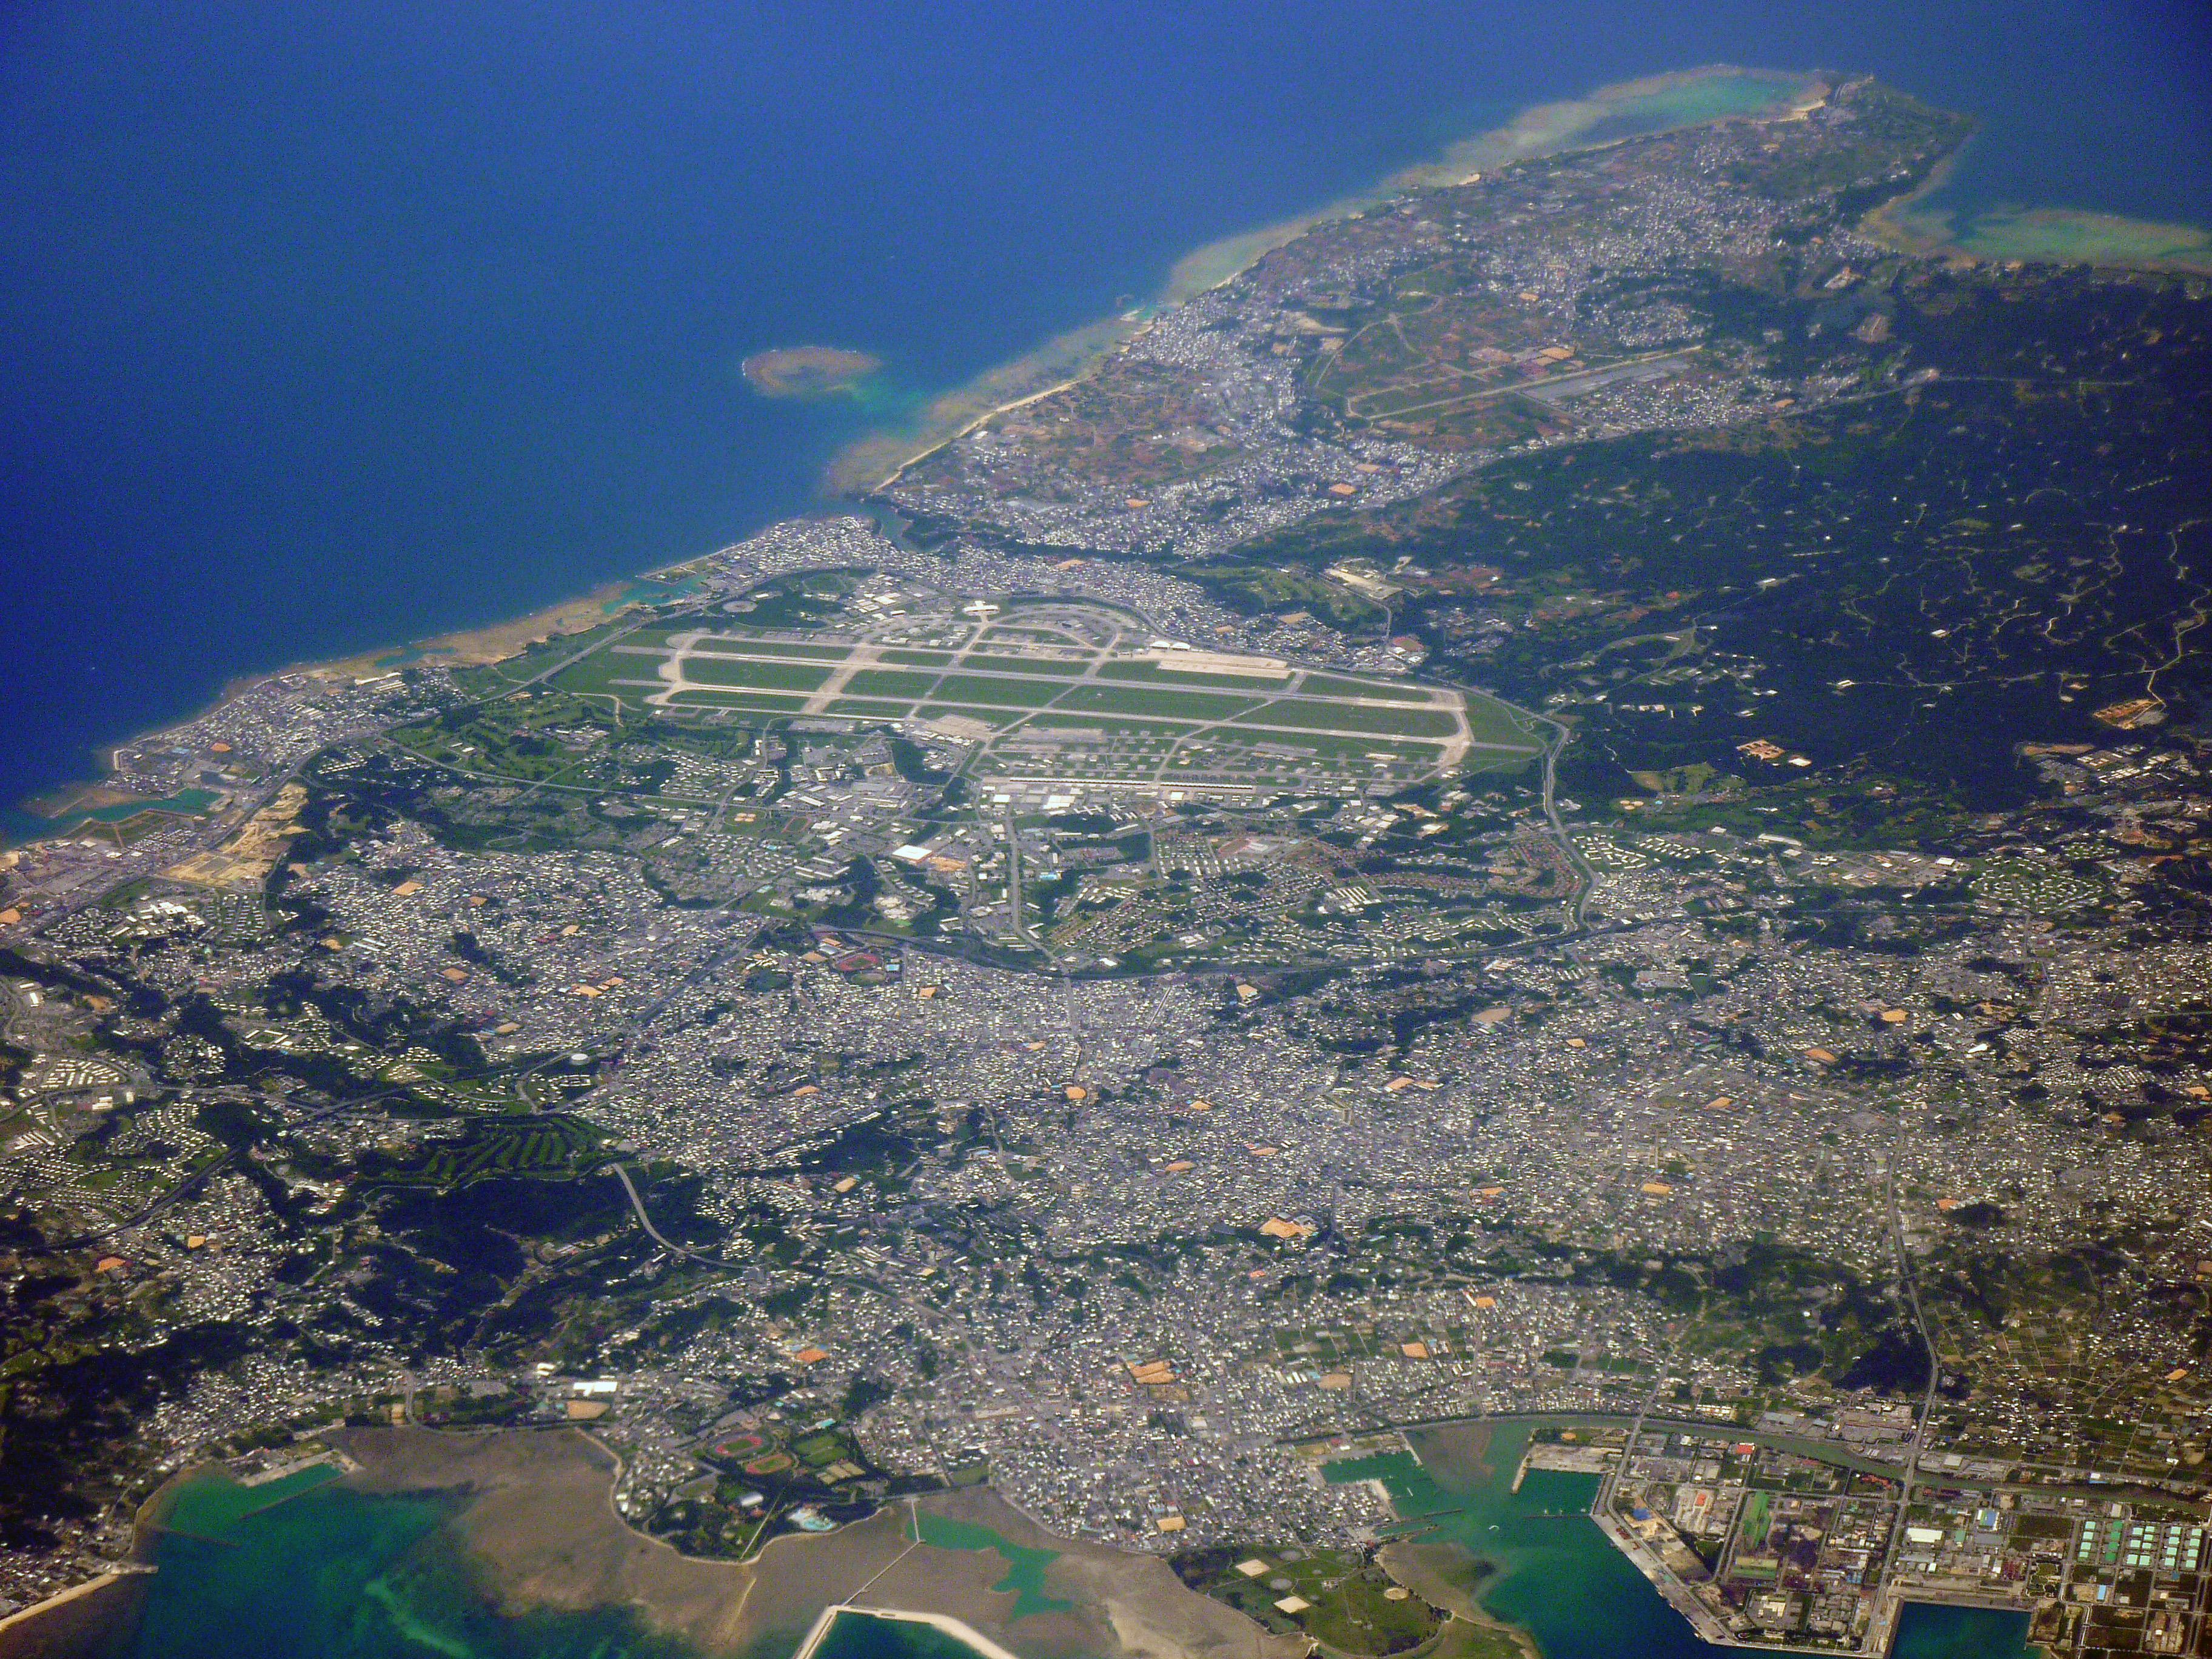 https://upload.wikimedia.org/wikipedia/commons/5/51/Kadena_Air_Base_20100526.jpg?download